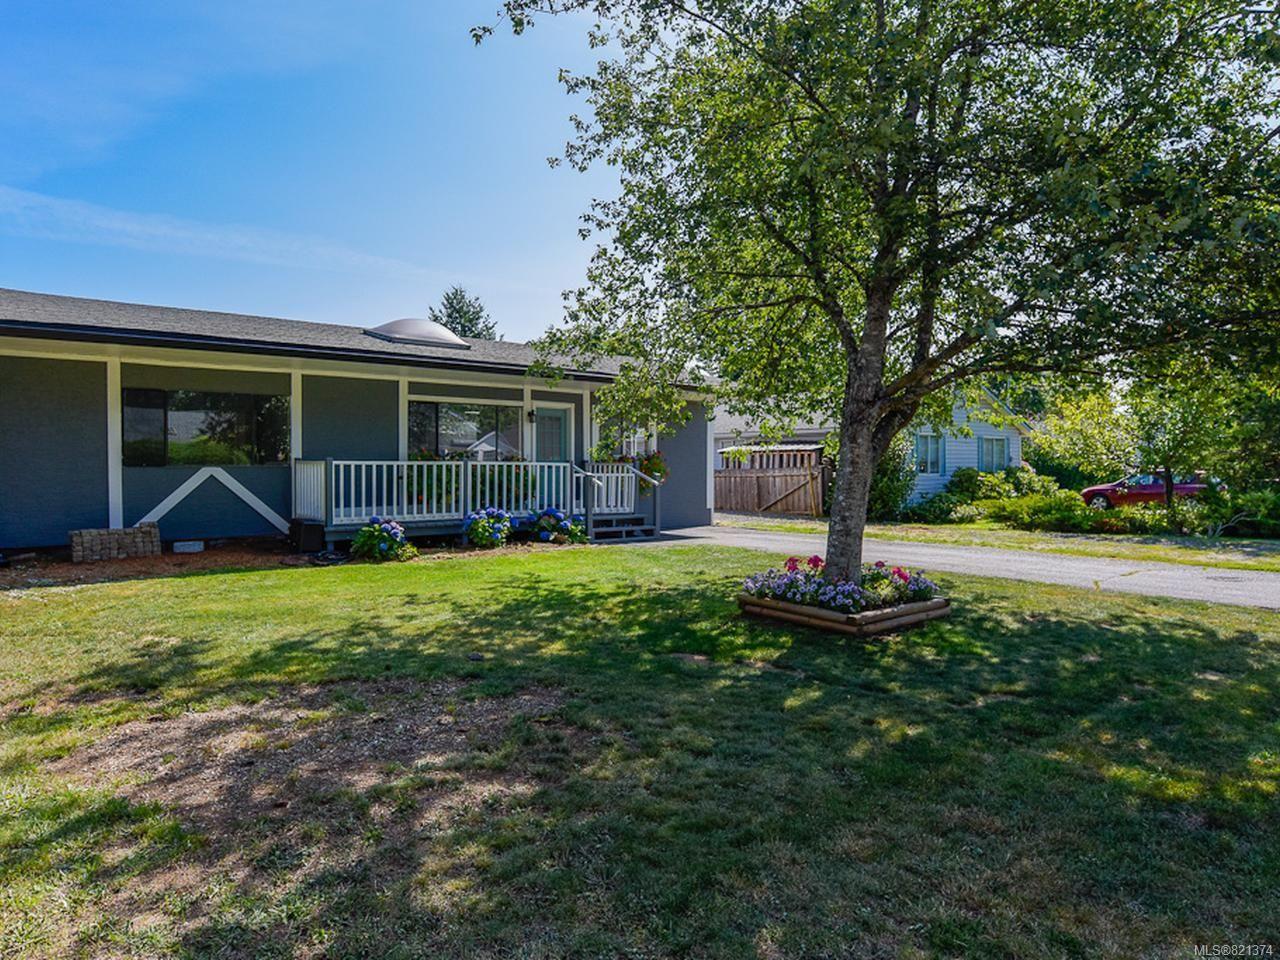 Main Photo: 1784 URQUHART Avenue in COURTENAY: CV Courtenay City House for sale (Comox Valley)  : MLS®# 821374